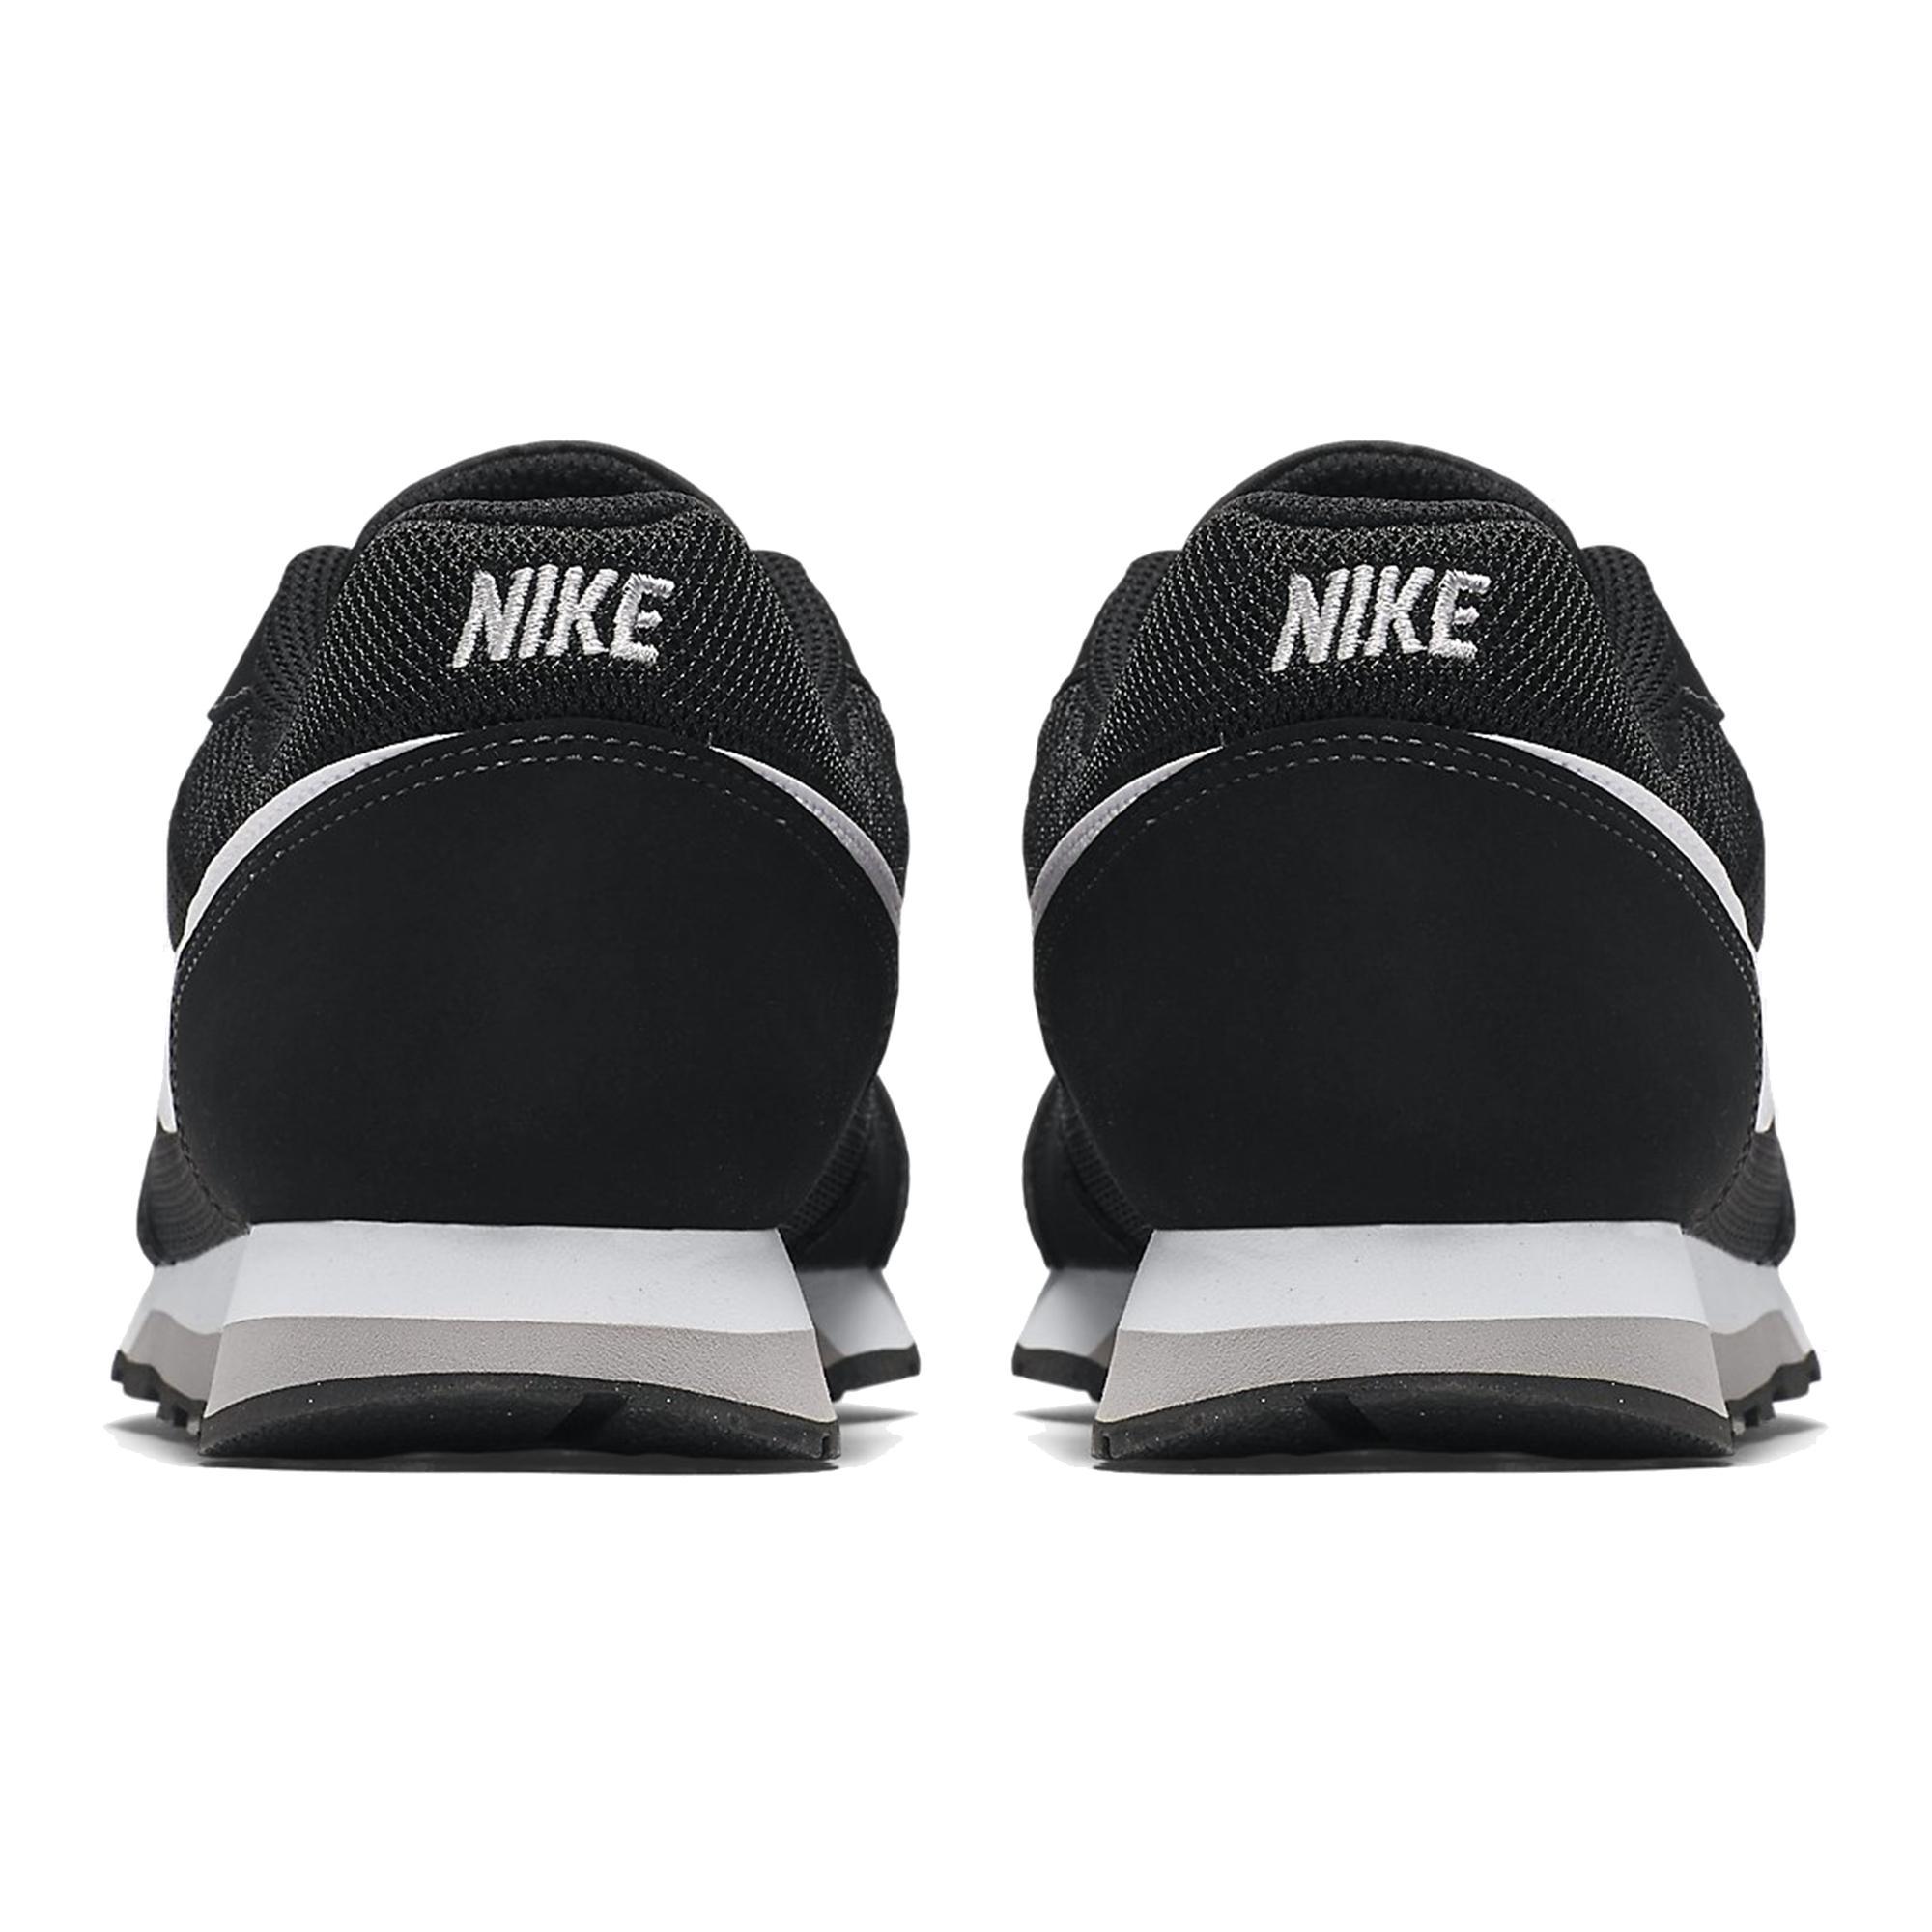 buy online 24172 2b783 Nike Md Runner 2 SS19 (GS) Spor Ayakkabı